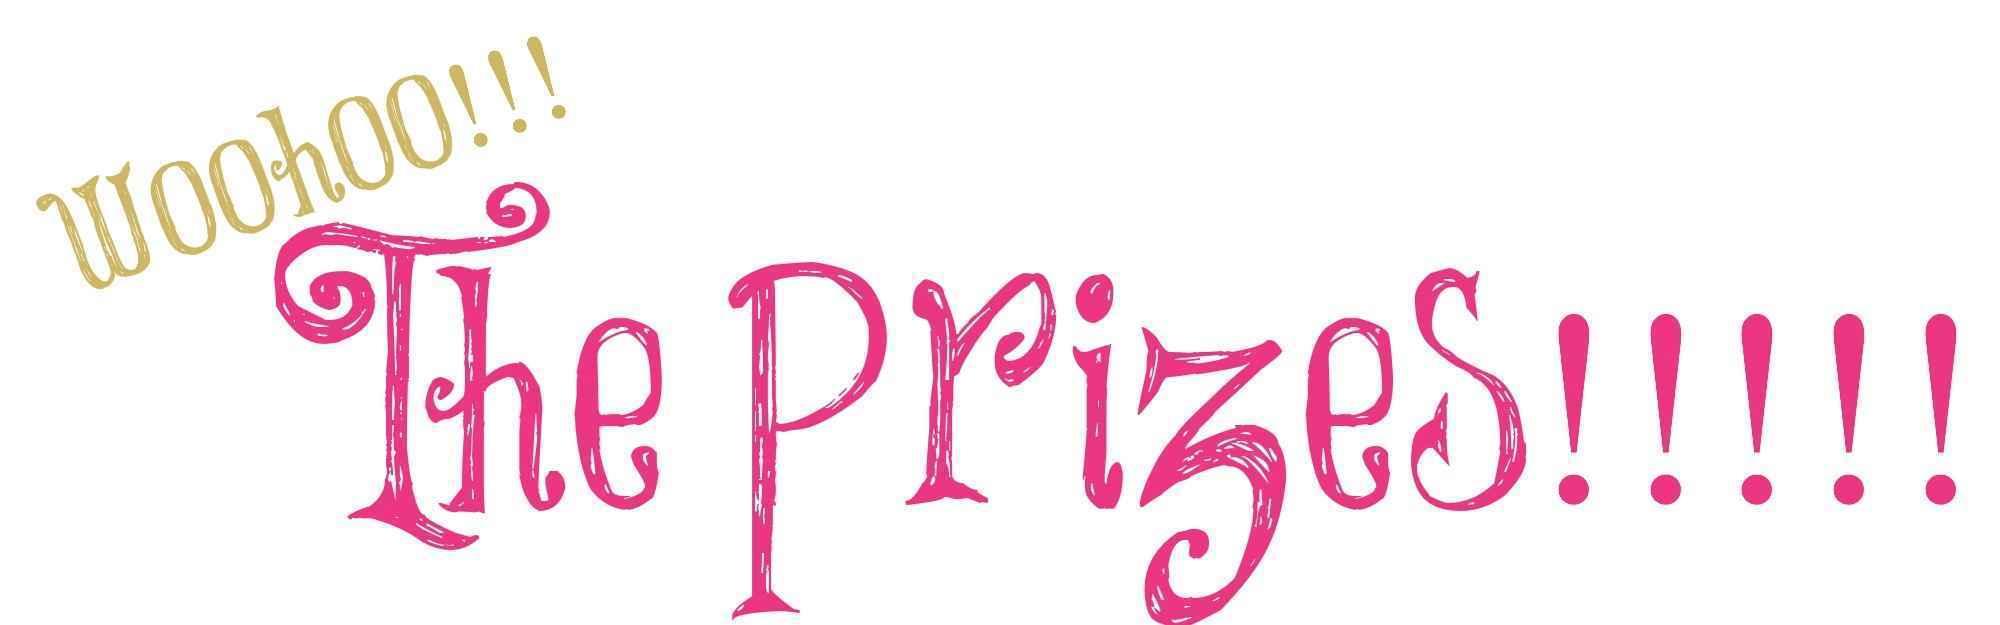 Essay prize distribution